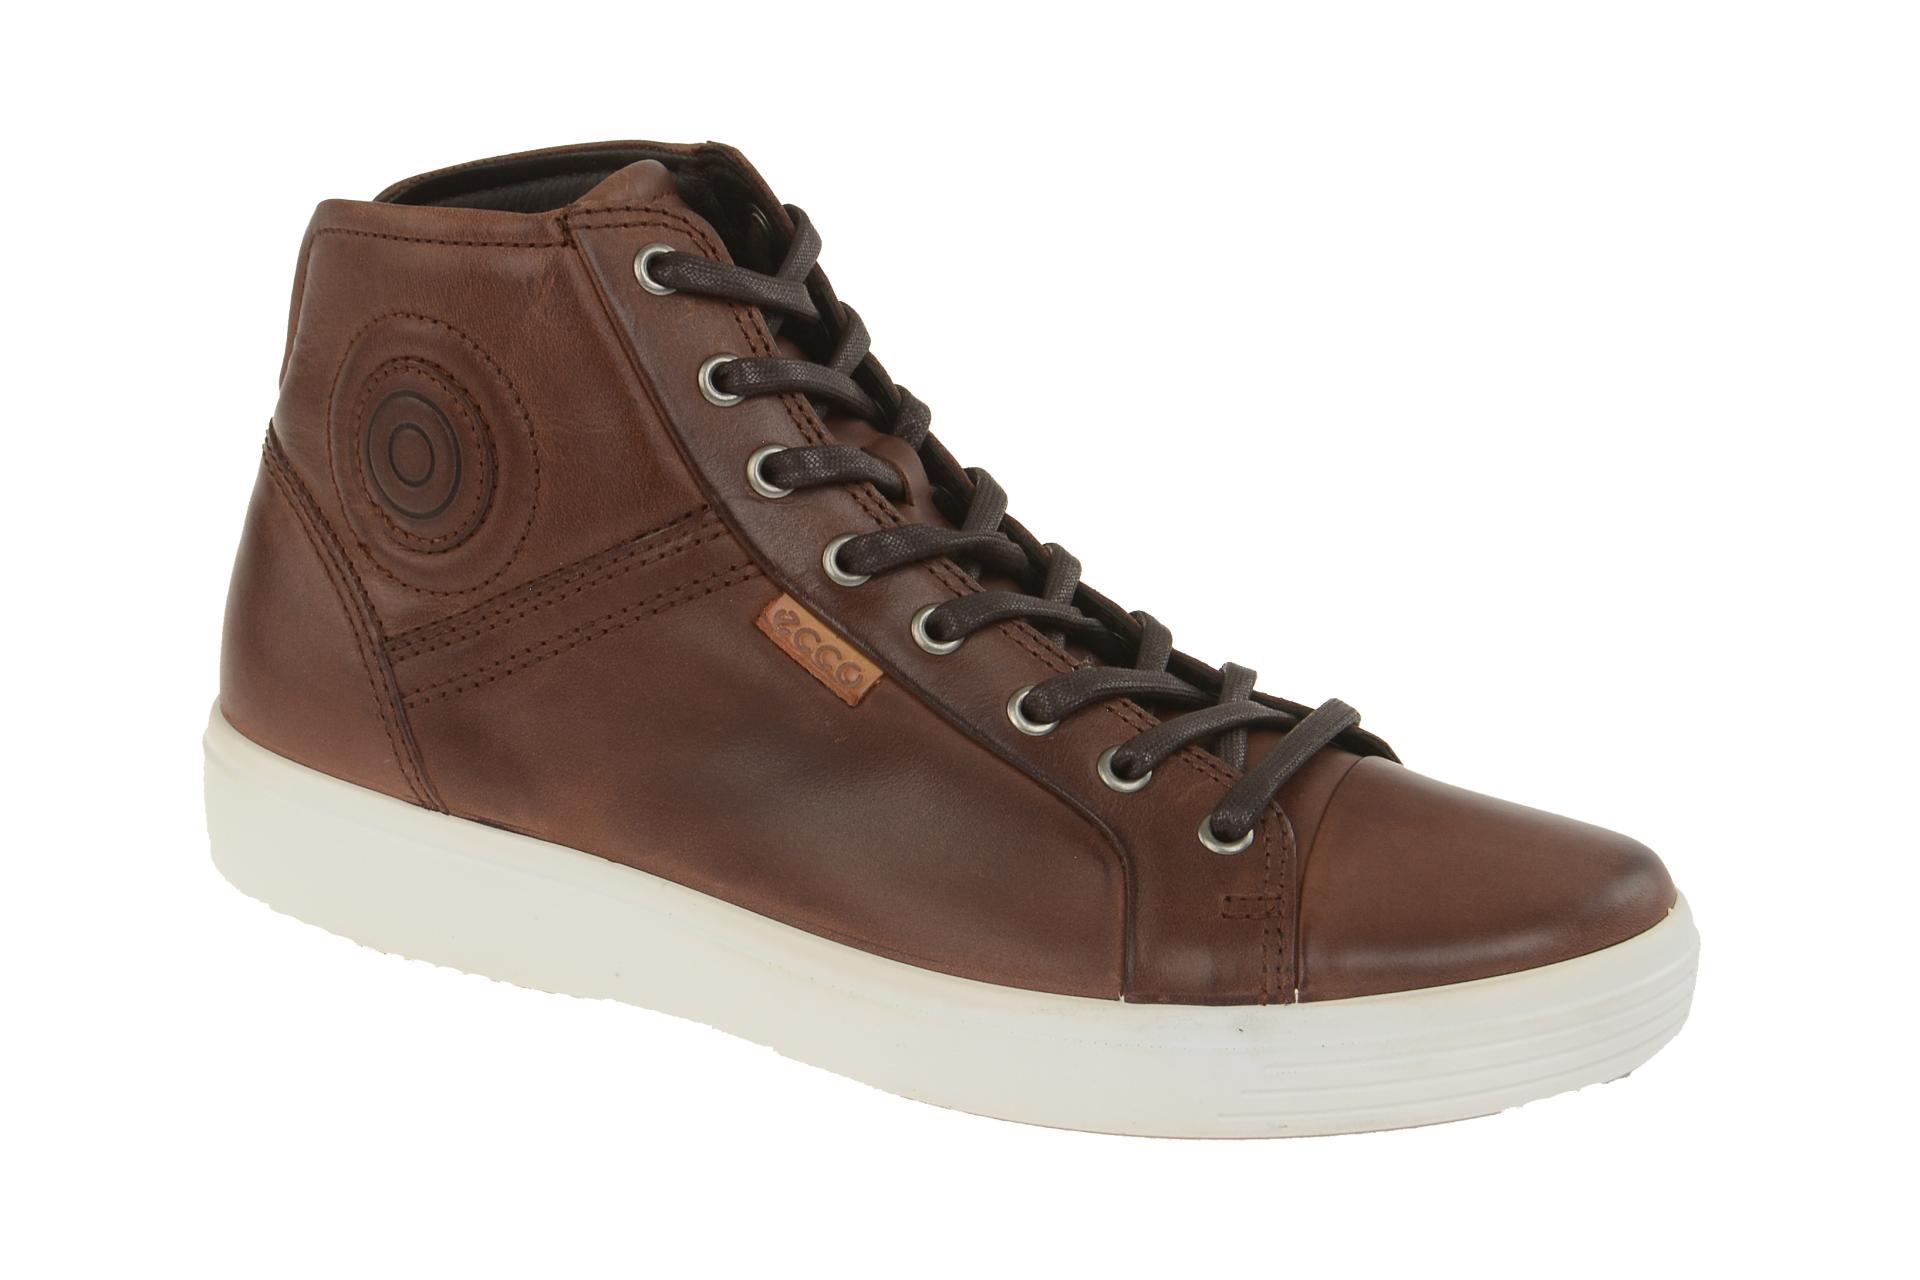 c8274aa5251420 ecco Soft 7 Stiefel braun mahogany Boots - Schuhhaus Strauch Shop